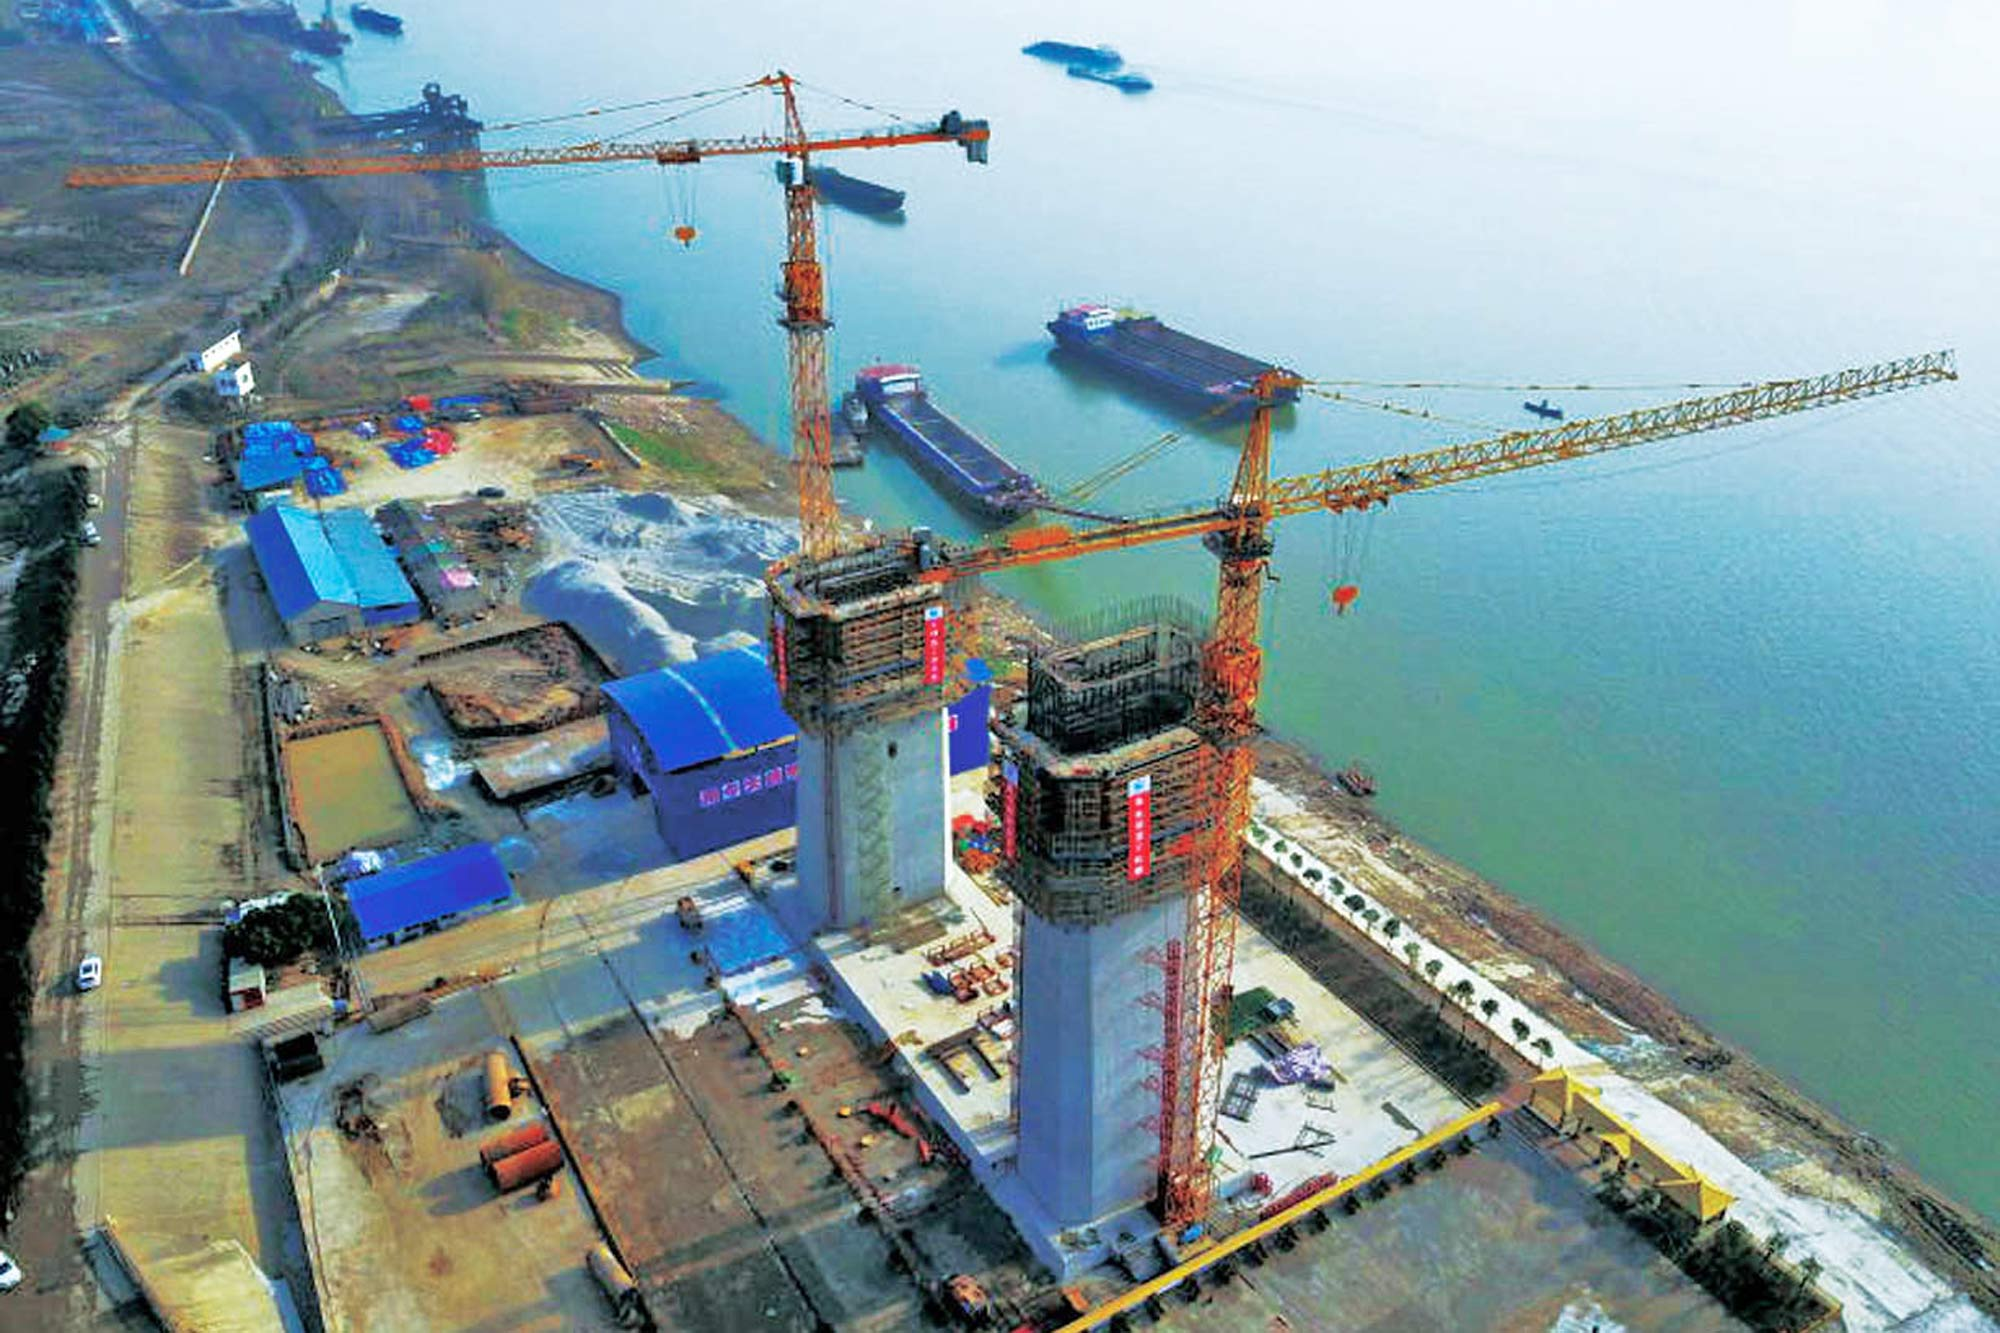 Potain tower cranes build record-breaking bridge in China